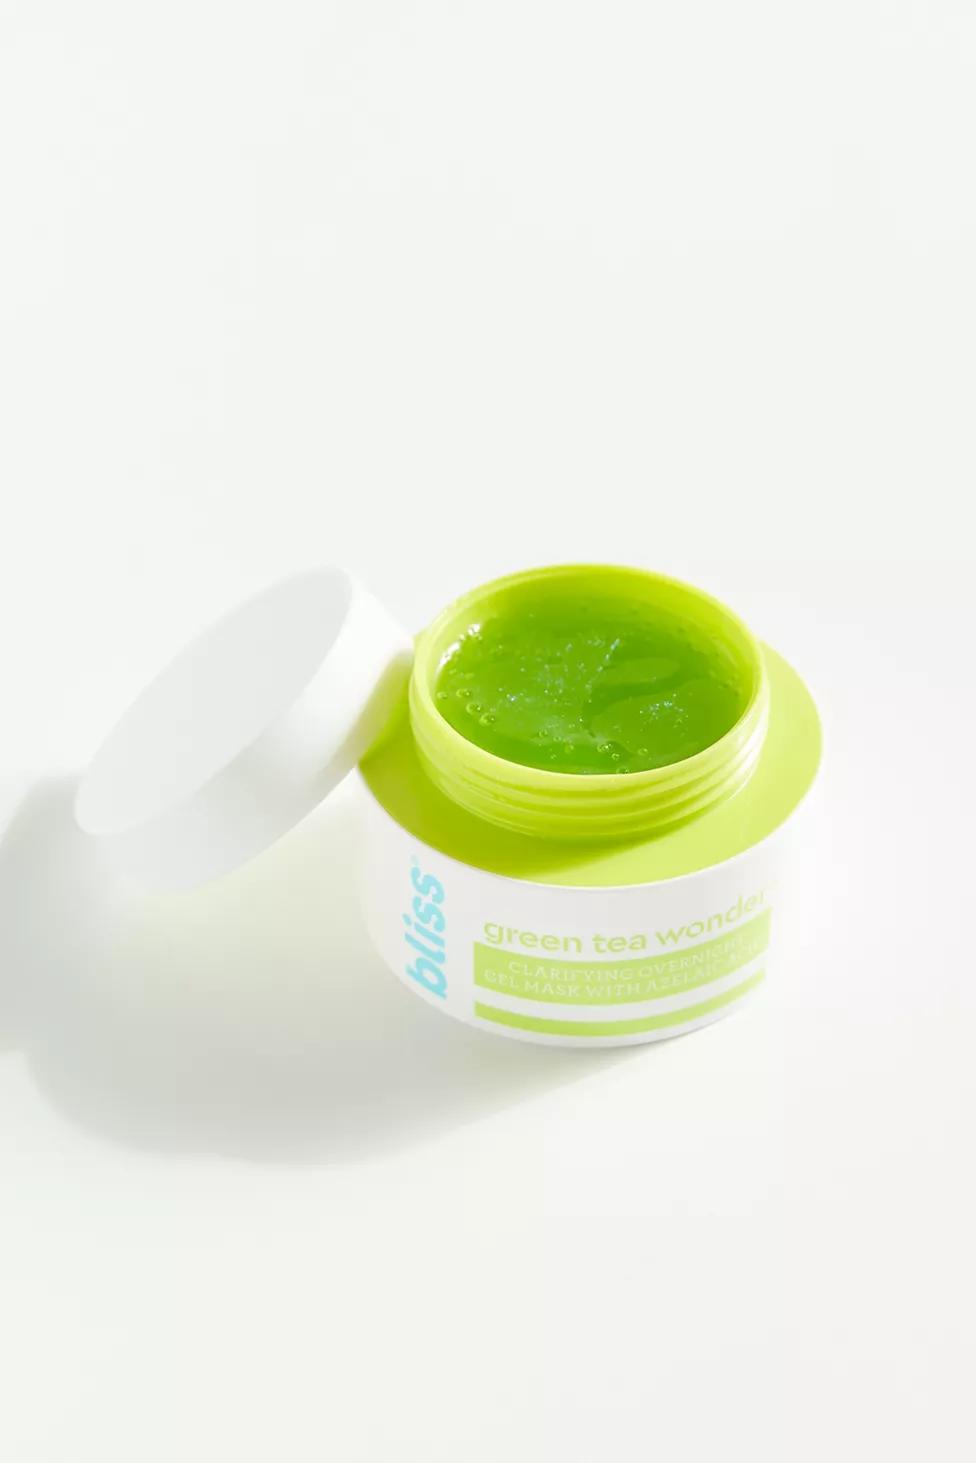 Photo of Bliss Green Tea Wonder Mask Green Tea greentea leaf